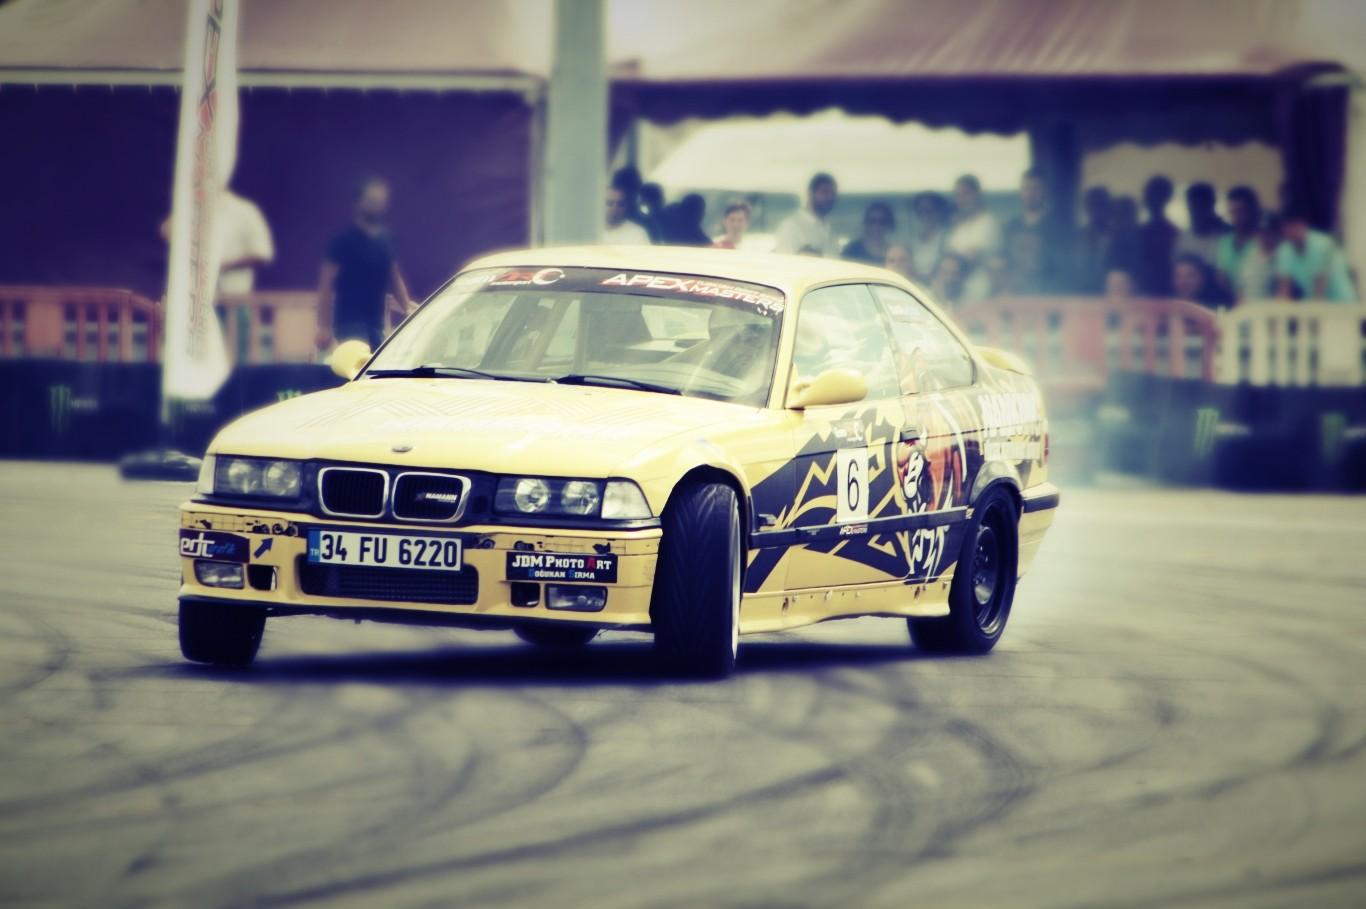 Wallpaper 1366x909 Px Bmw E36 Drift Old Car Racing 1366x909